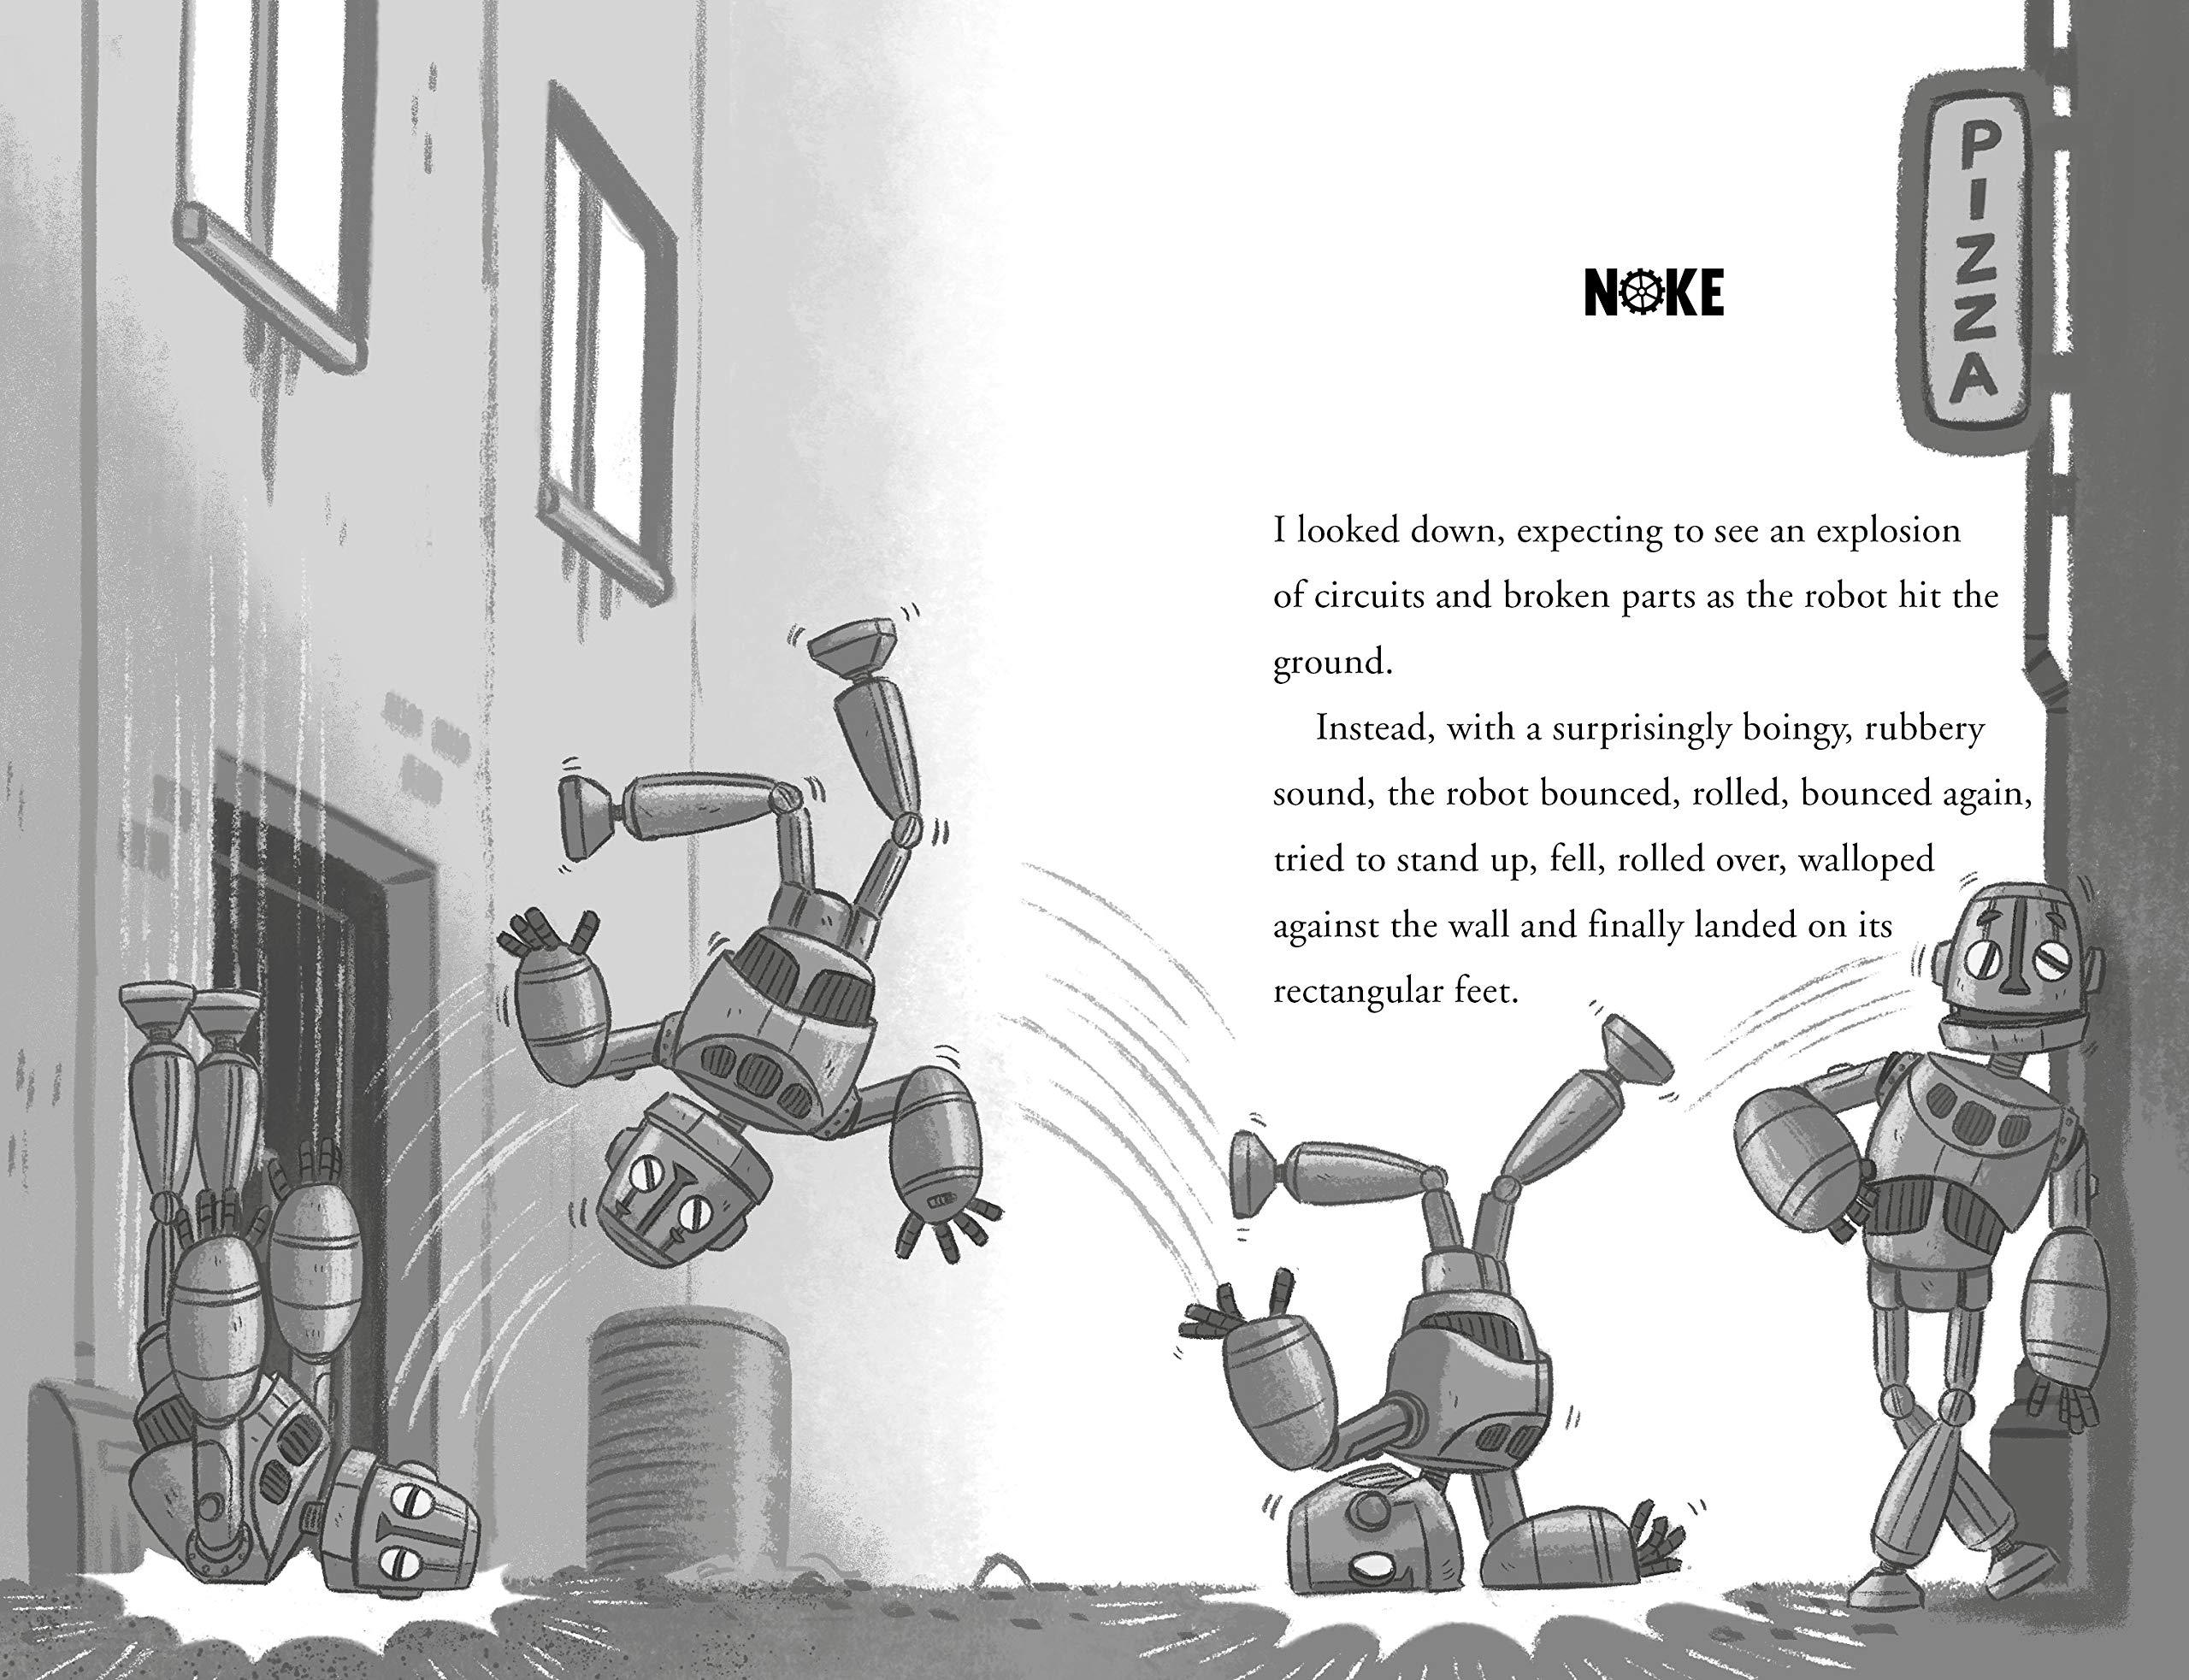 BOOT small robot, BIG adventure: Book 1: Amazon.es: Hegarty, Shane, Mantle, Ben: Libros en idiomas extranjeros